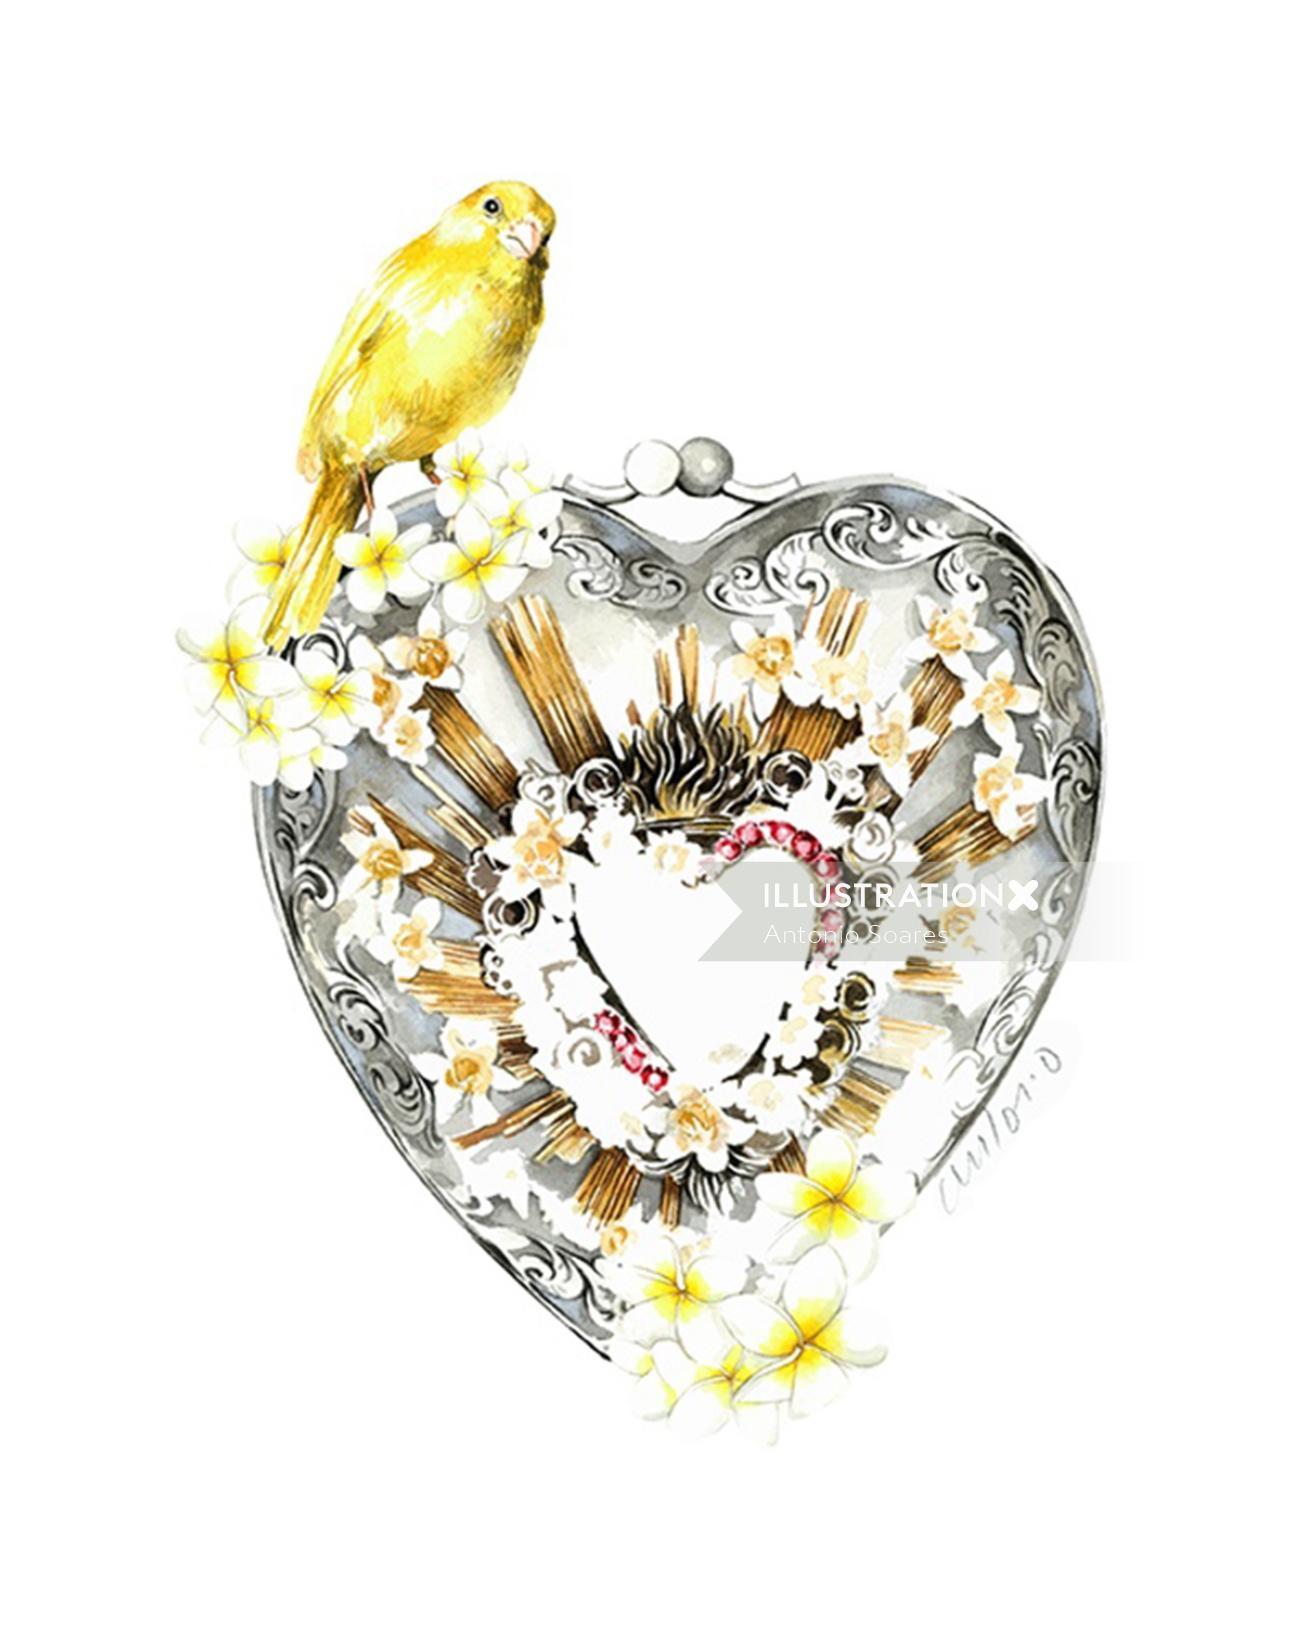 Heart Shaped Bag Fashion Sketch